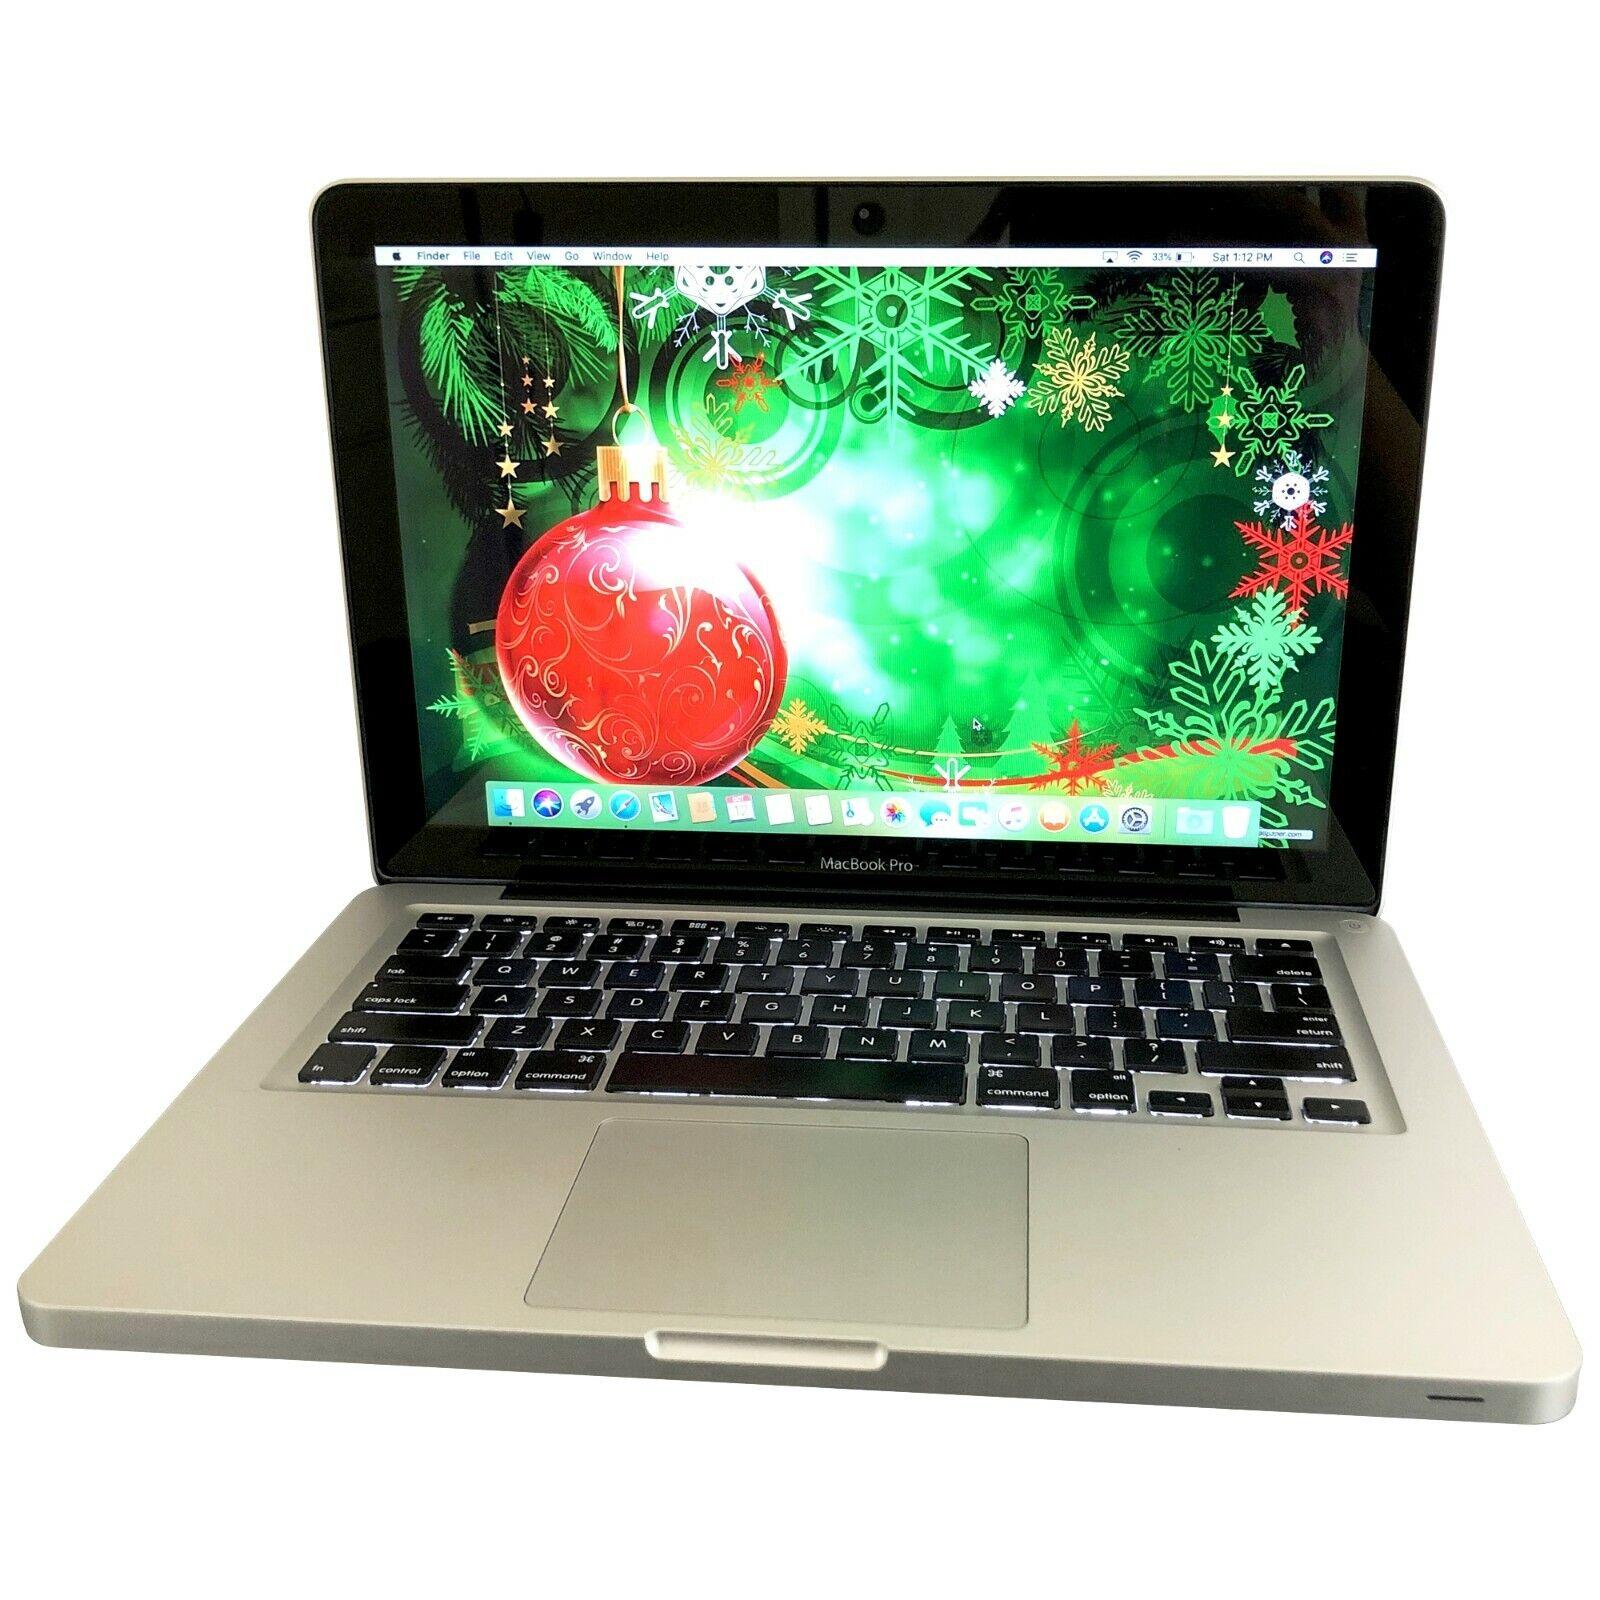 Apple Macbook Pro 13 Laptop / 8GB RAM 256GB SSD / 10.15 CATALINA + 2 YR WARRANTY. Buy it now for 449.99